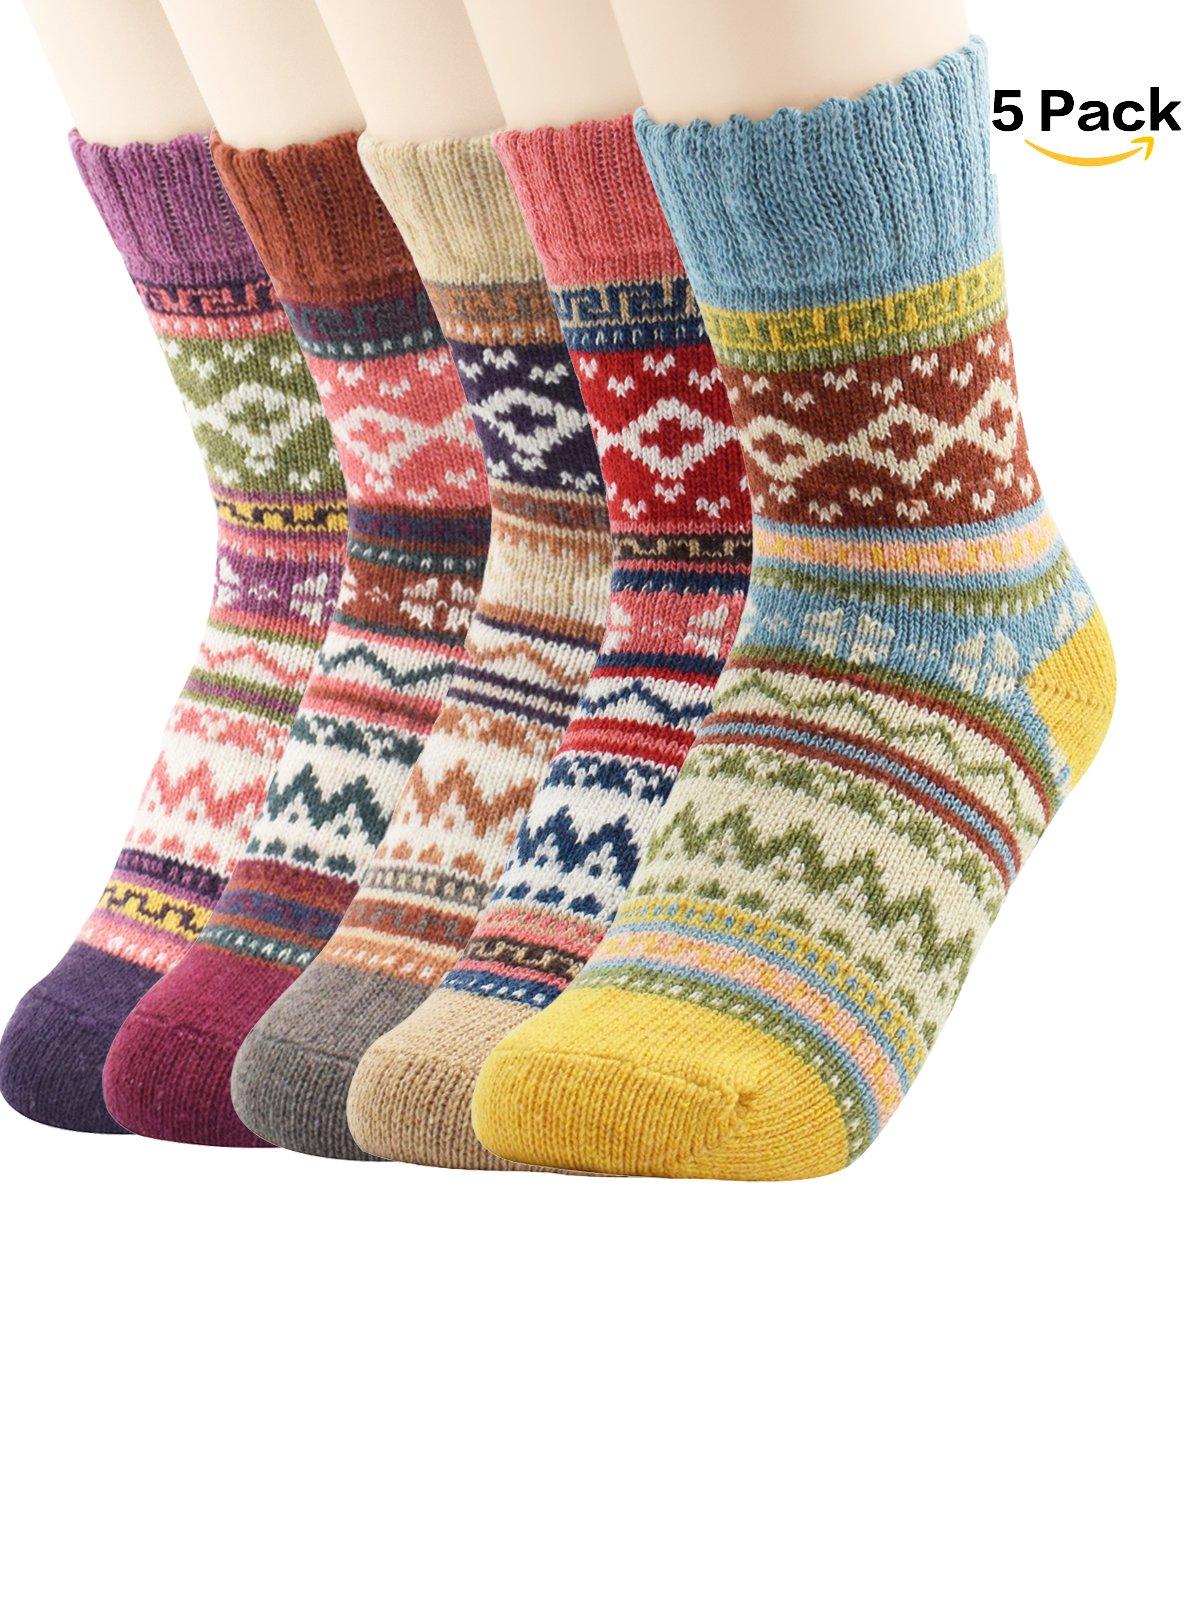 Zando Women Fashion Printed Thick Wool Knit Winter Casual Soft Warm Crew Socks Vintage Style 3-5 Pairs F 5 Pack-Diamond(1)